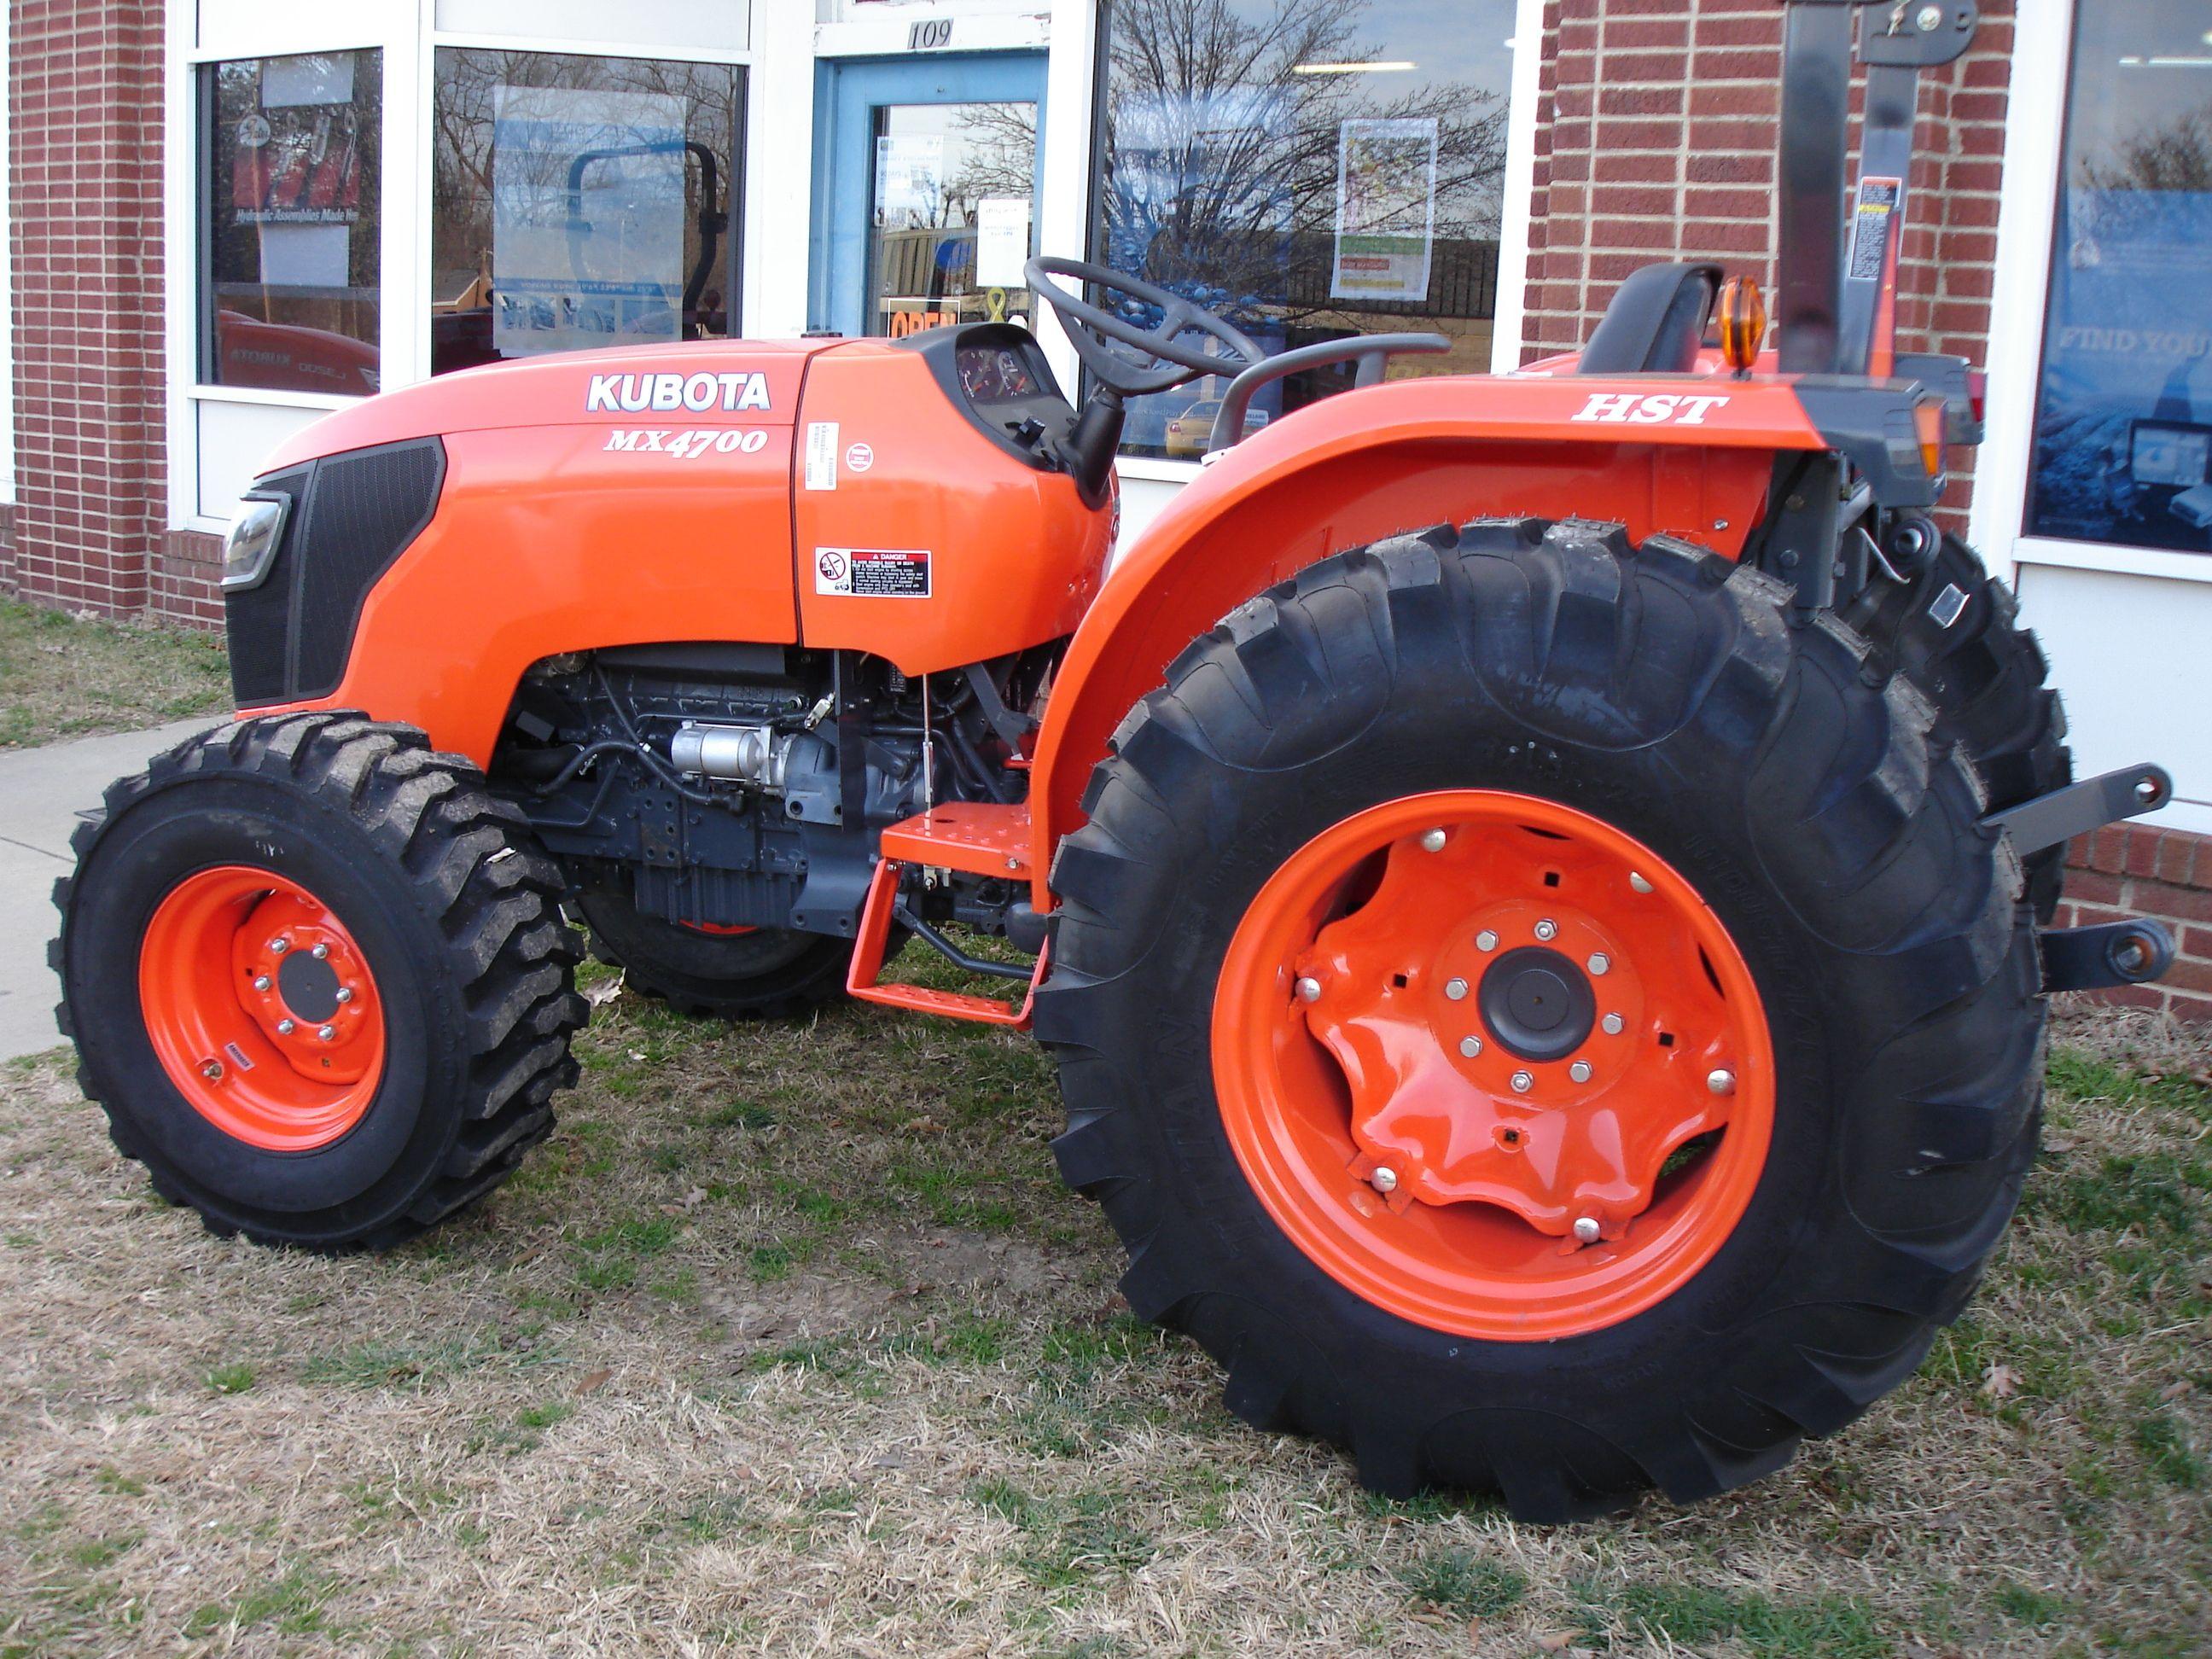 Kubota Mx4700 HST Tractor Implements, Kubota, Tractor